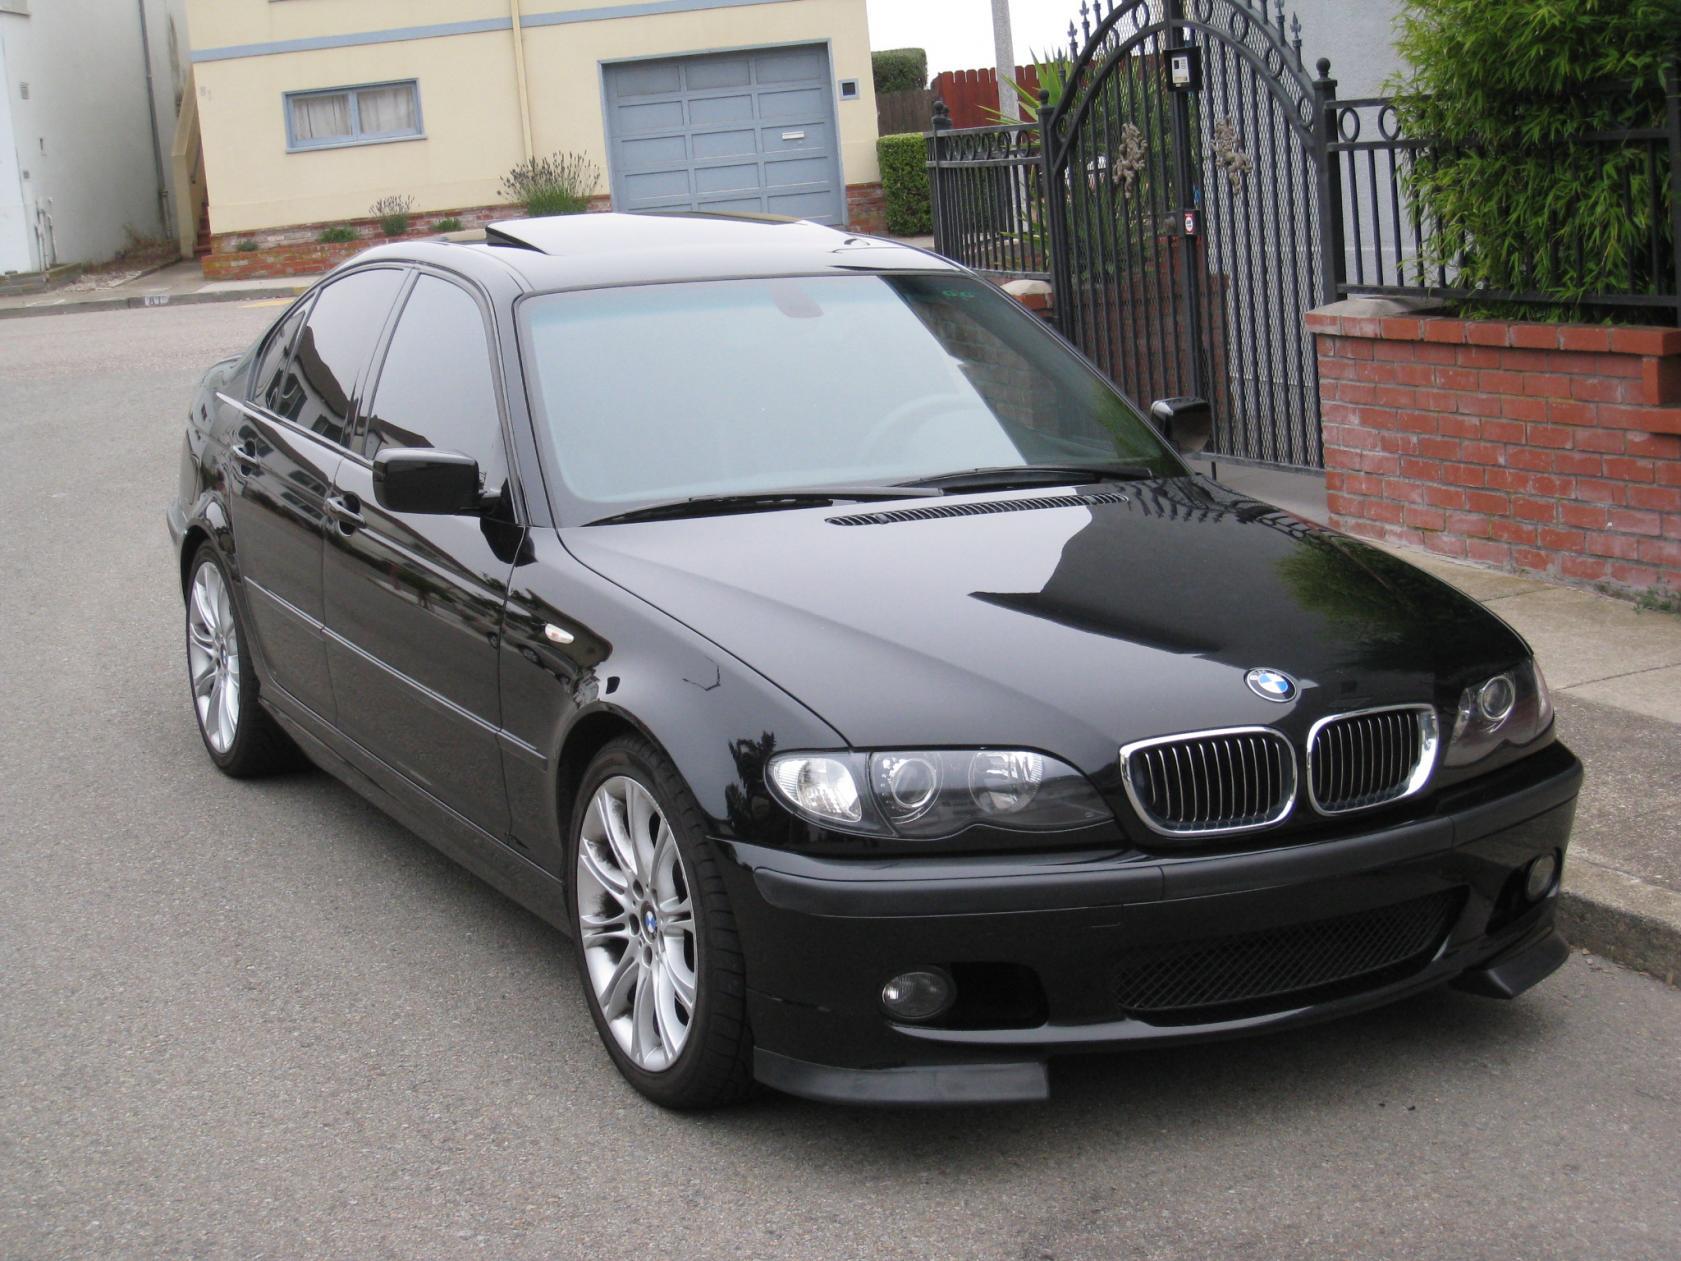 FS: 2005 BMW 330i ZHP Performance Edition - JET BLACK - 6SPD - San ...